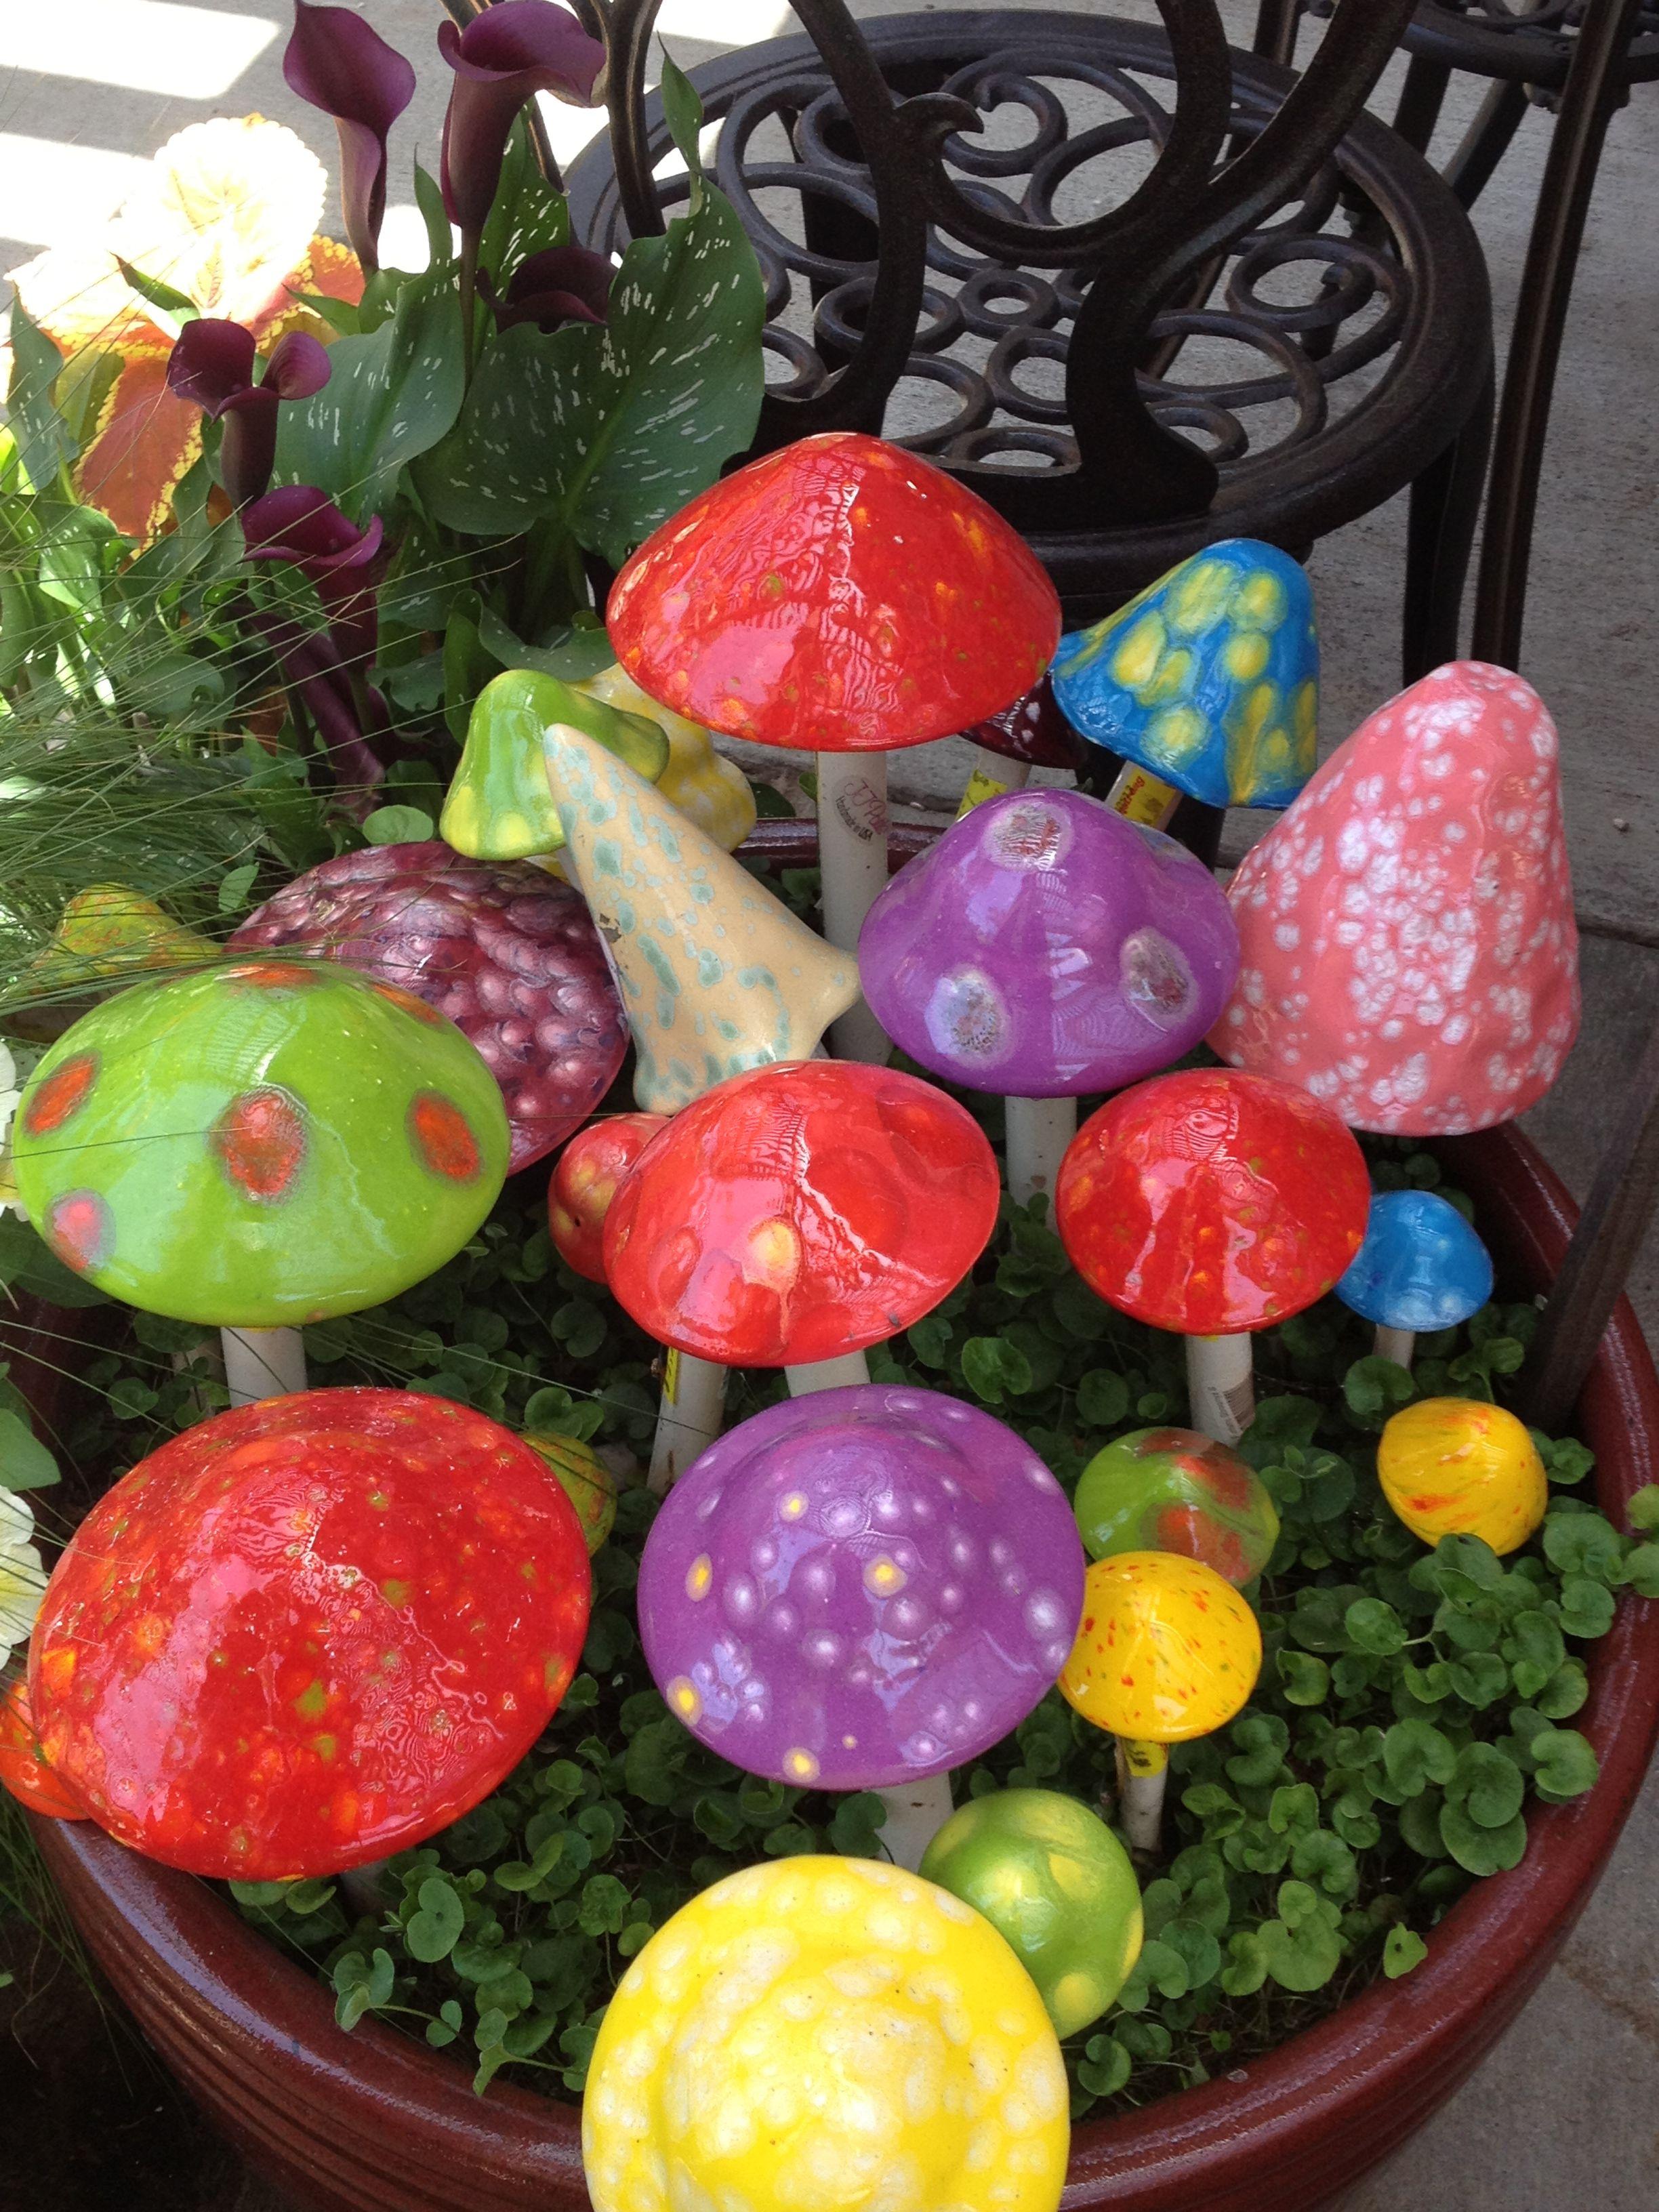 25 easy diy garden projects you can start now diy garden